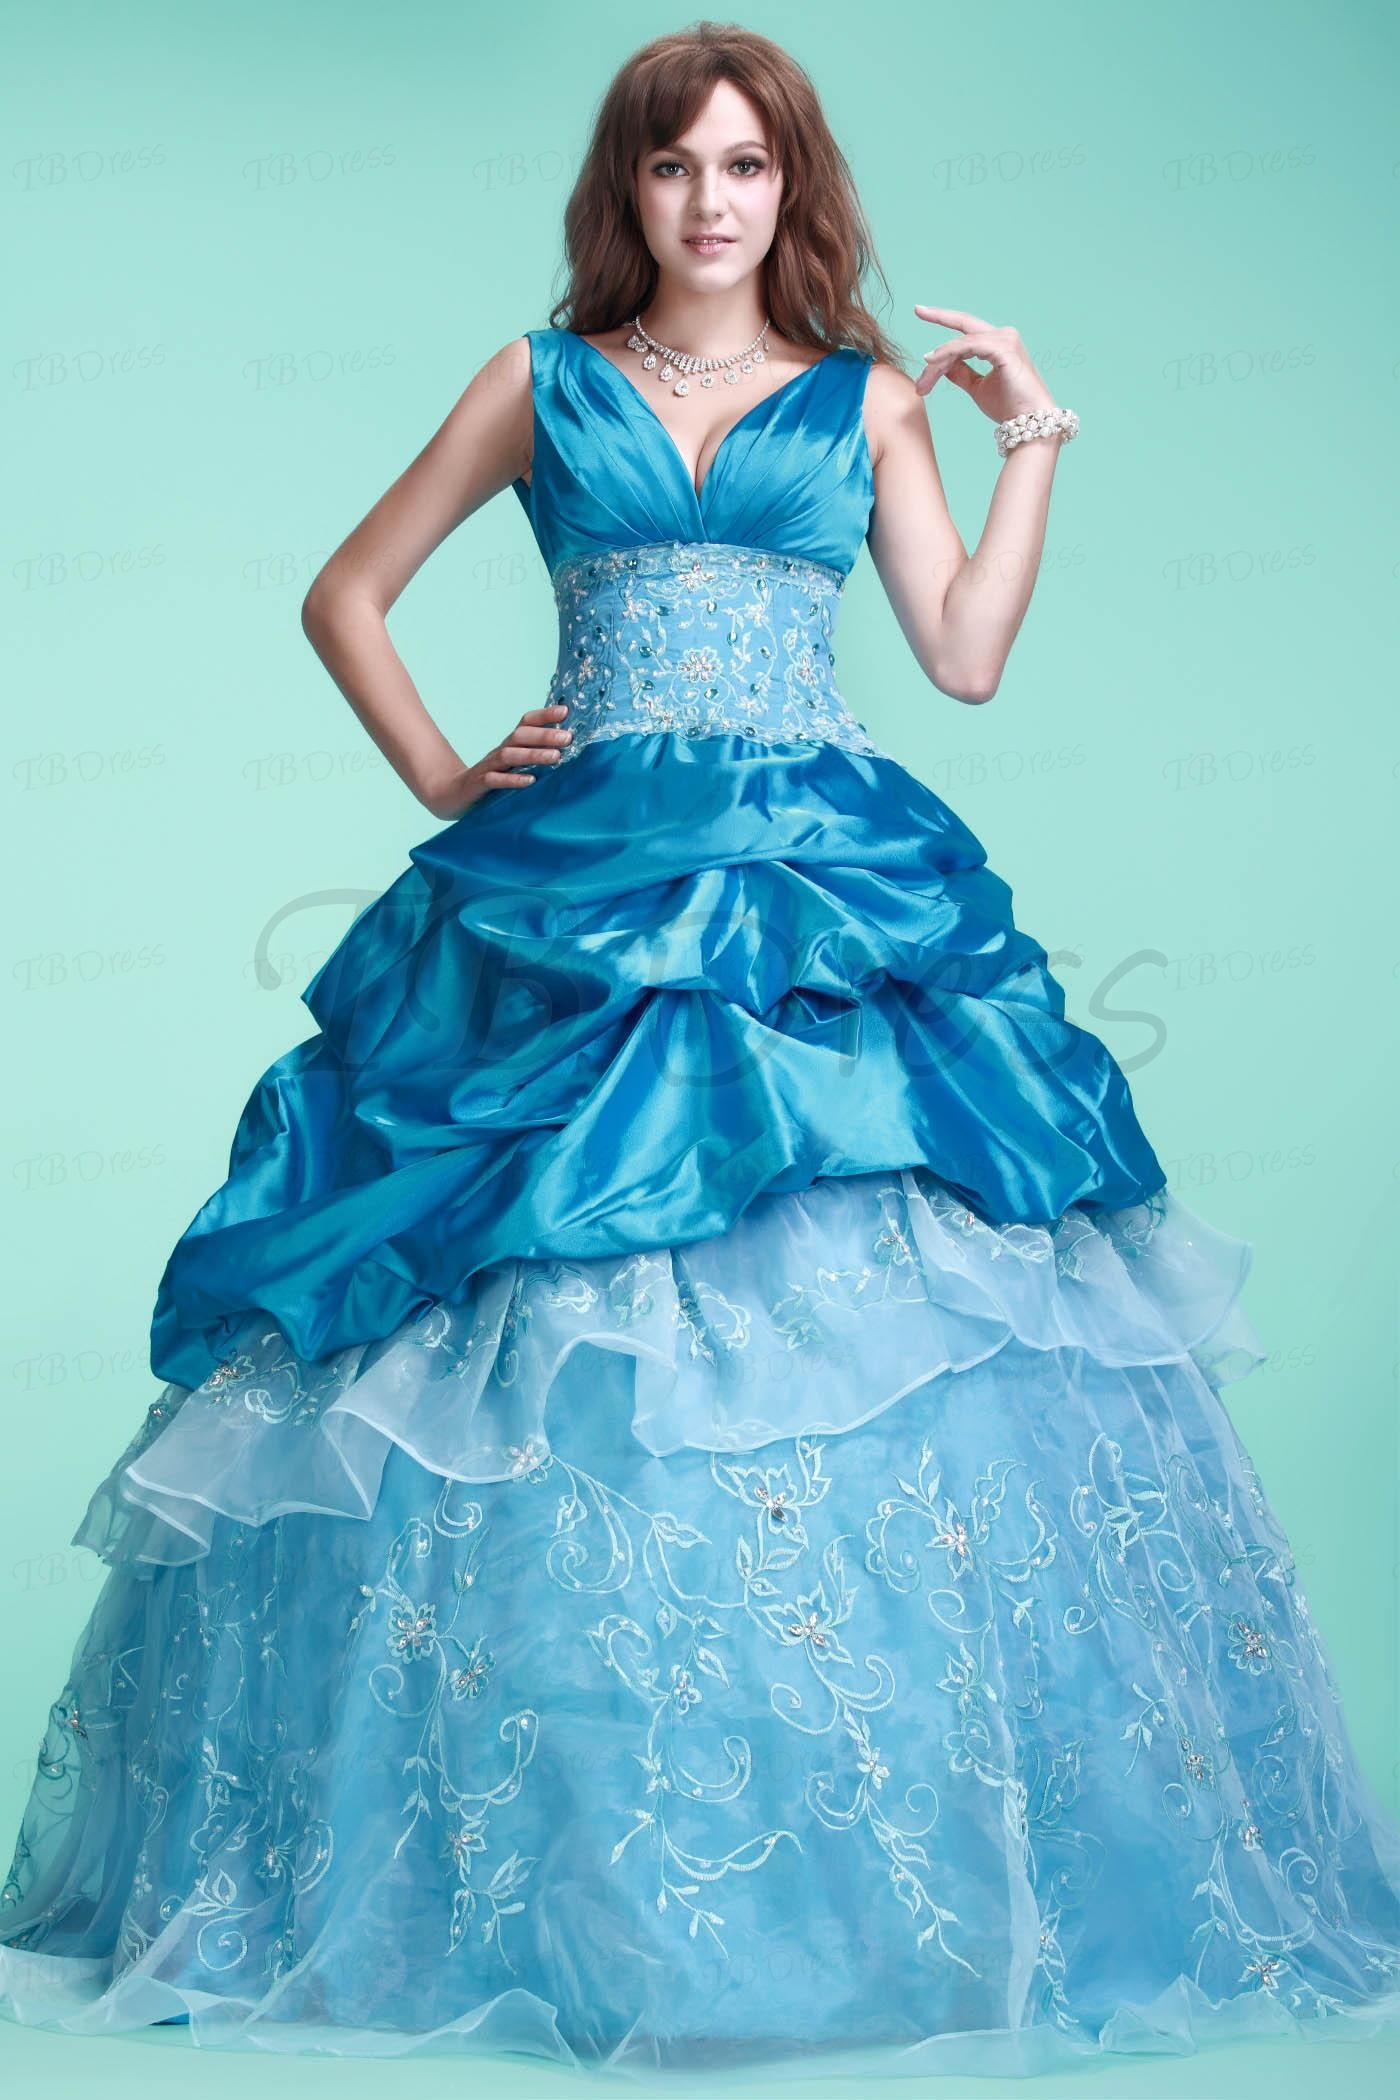 Beautiful ball gown vneck floorlength elaus quinceaneraball gown